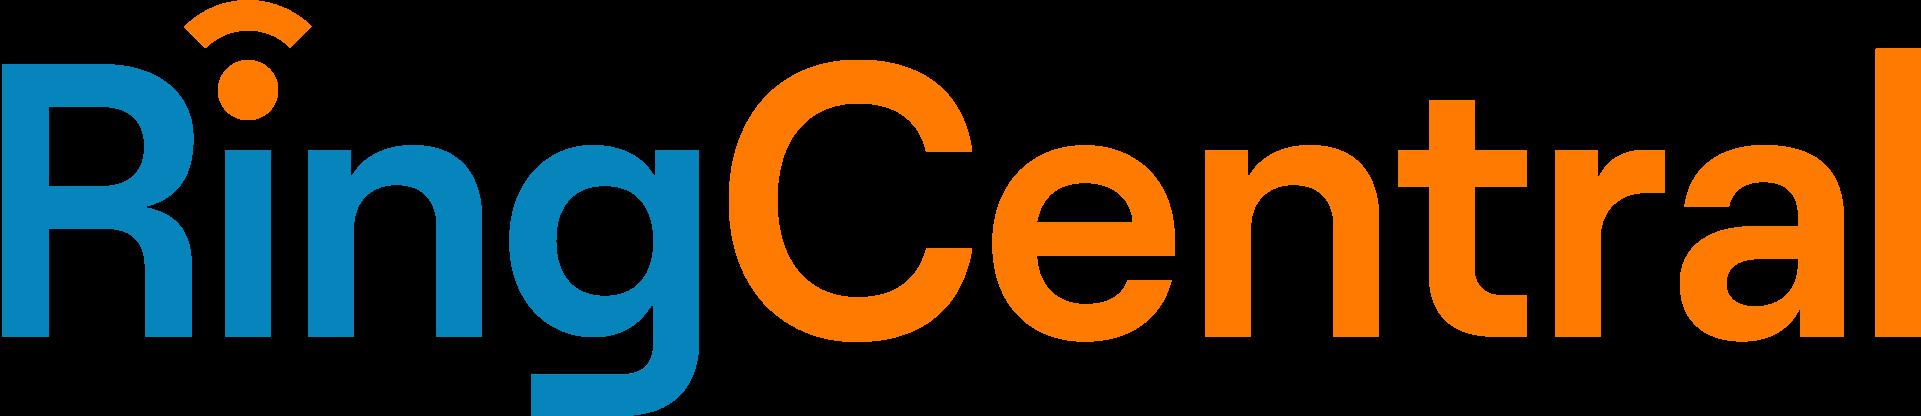 ringcentral_2.0_logo